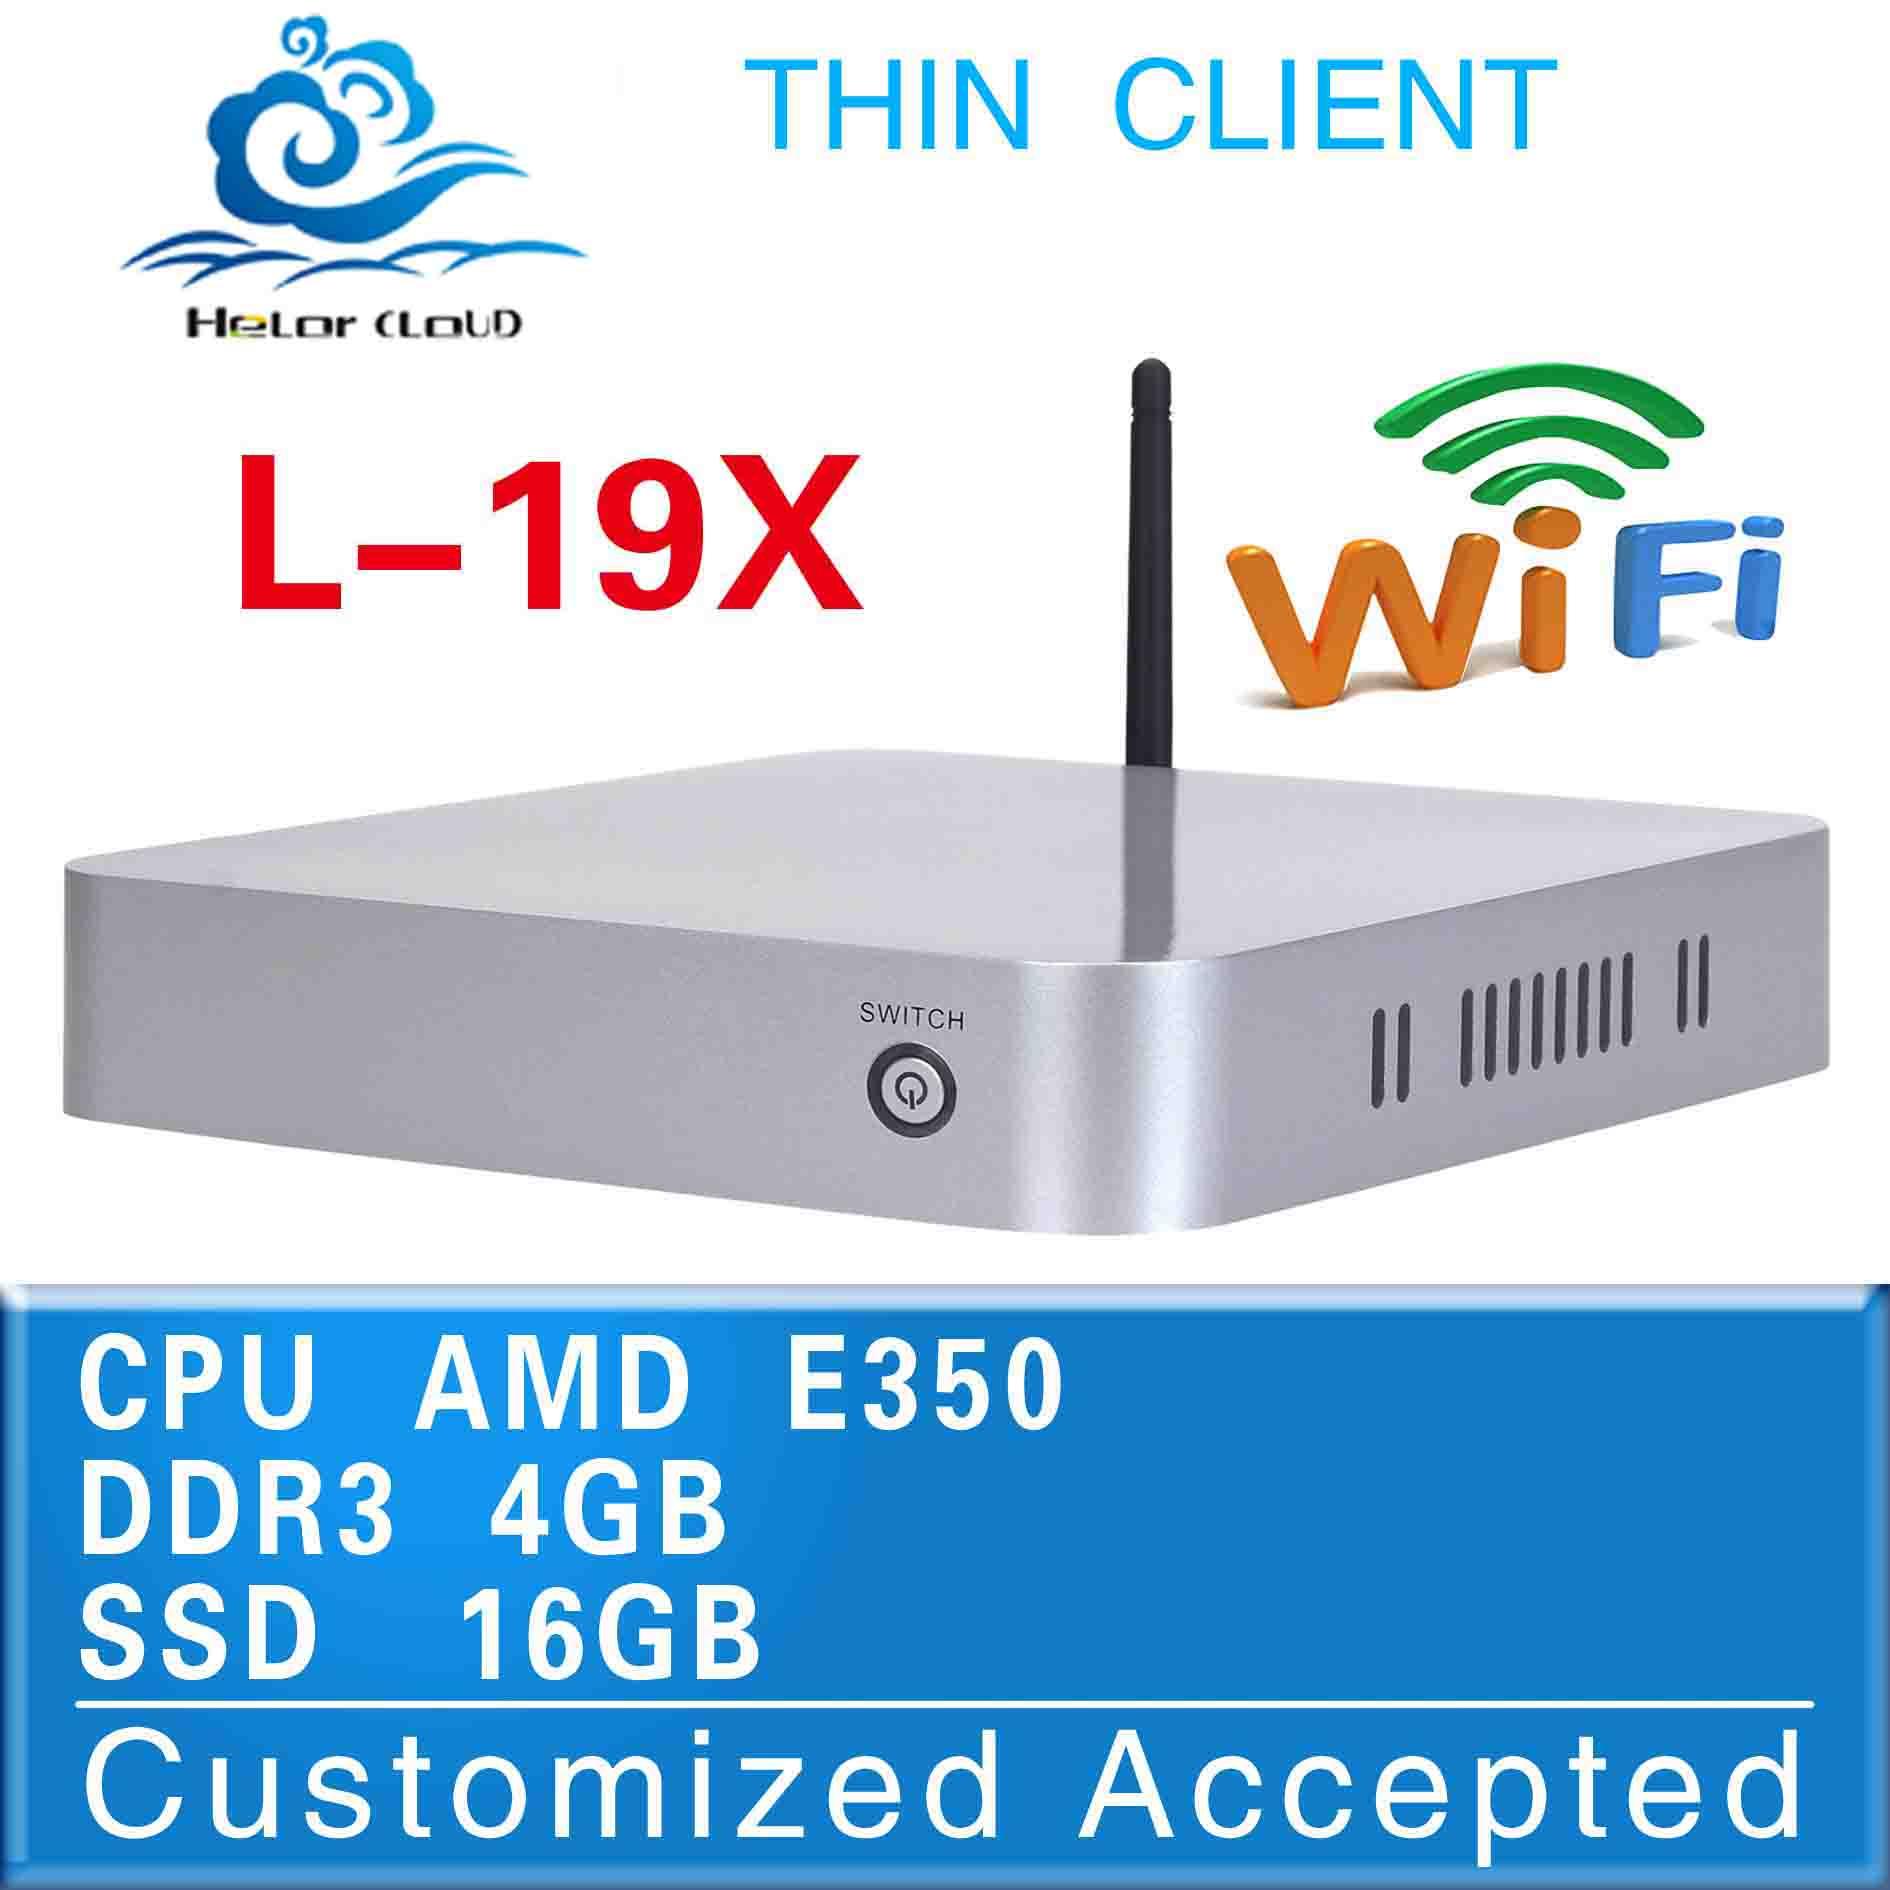 2015 newest housing estate surveillance system server l-19x E350 fan desktop dual core thin client 4g ram 16g ssd 1080p screen(China (Mainland))